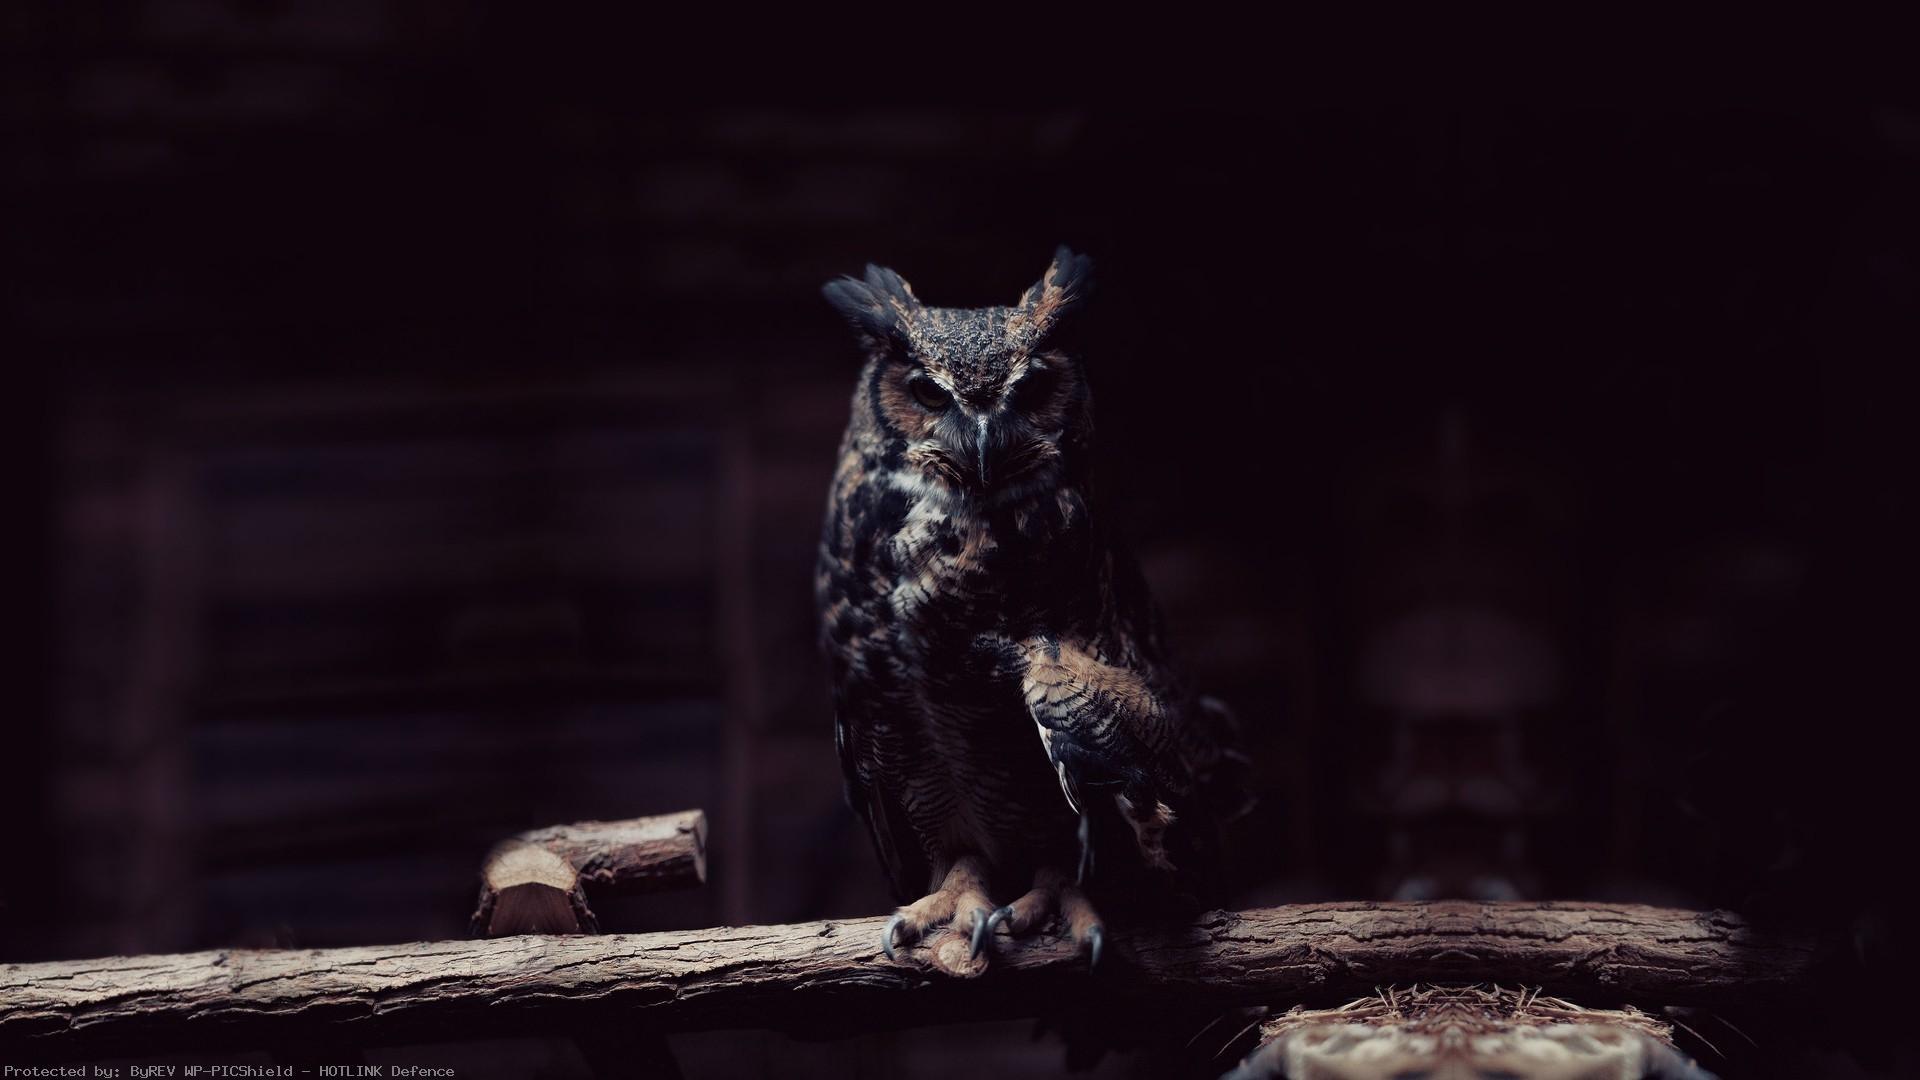 Dark-owl-HD-wallpaper-wp3804373